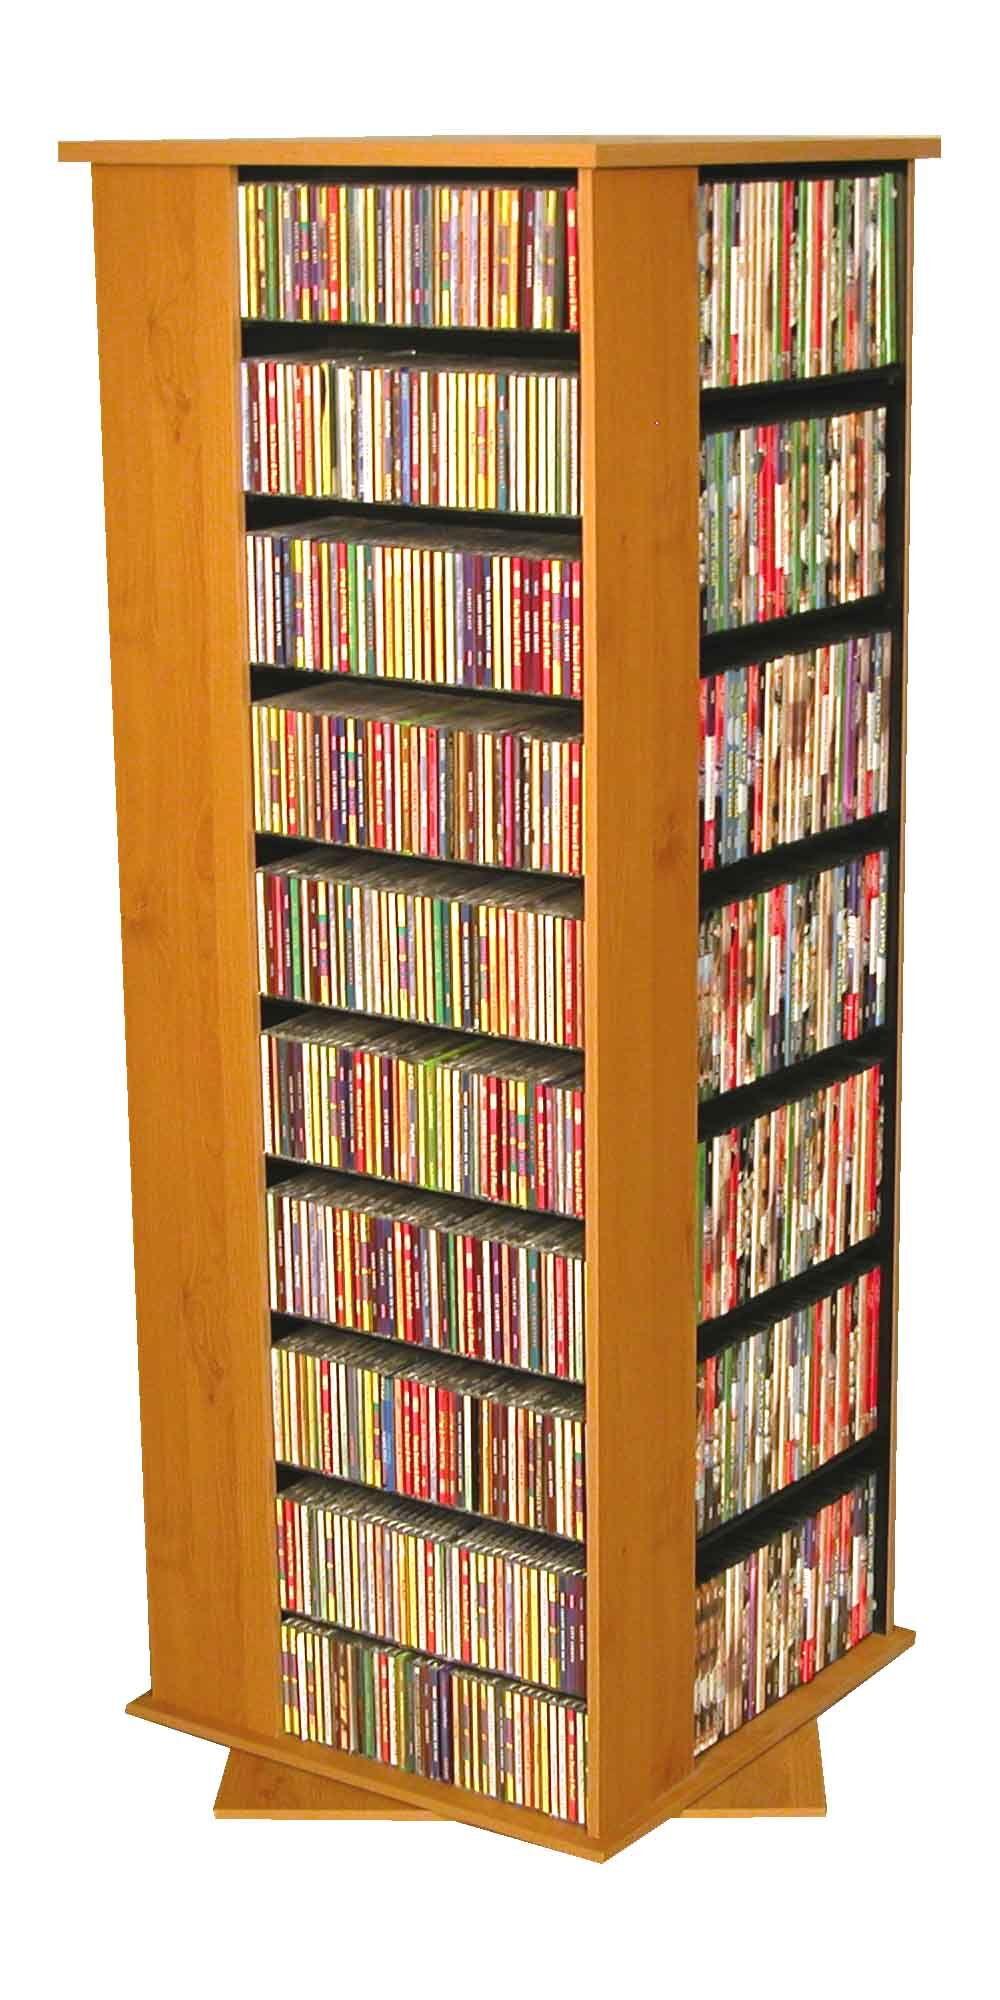 1600 CD Molded Multimedia Revolving Tower Color: Oak